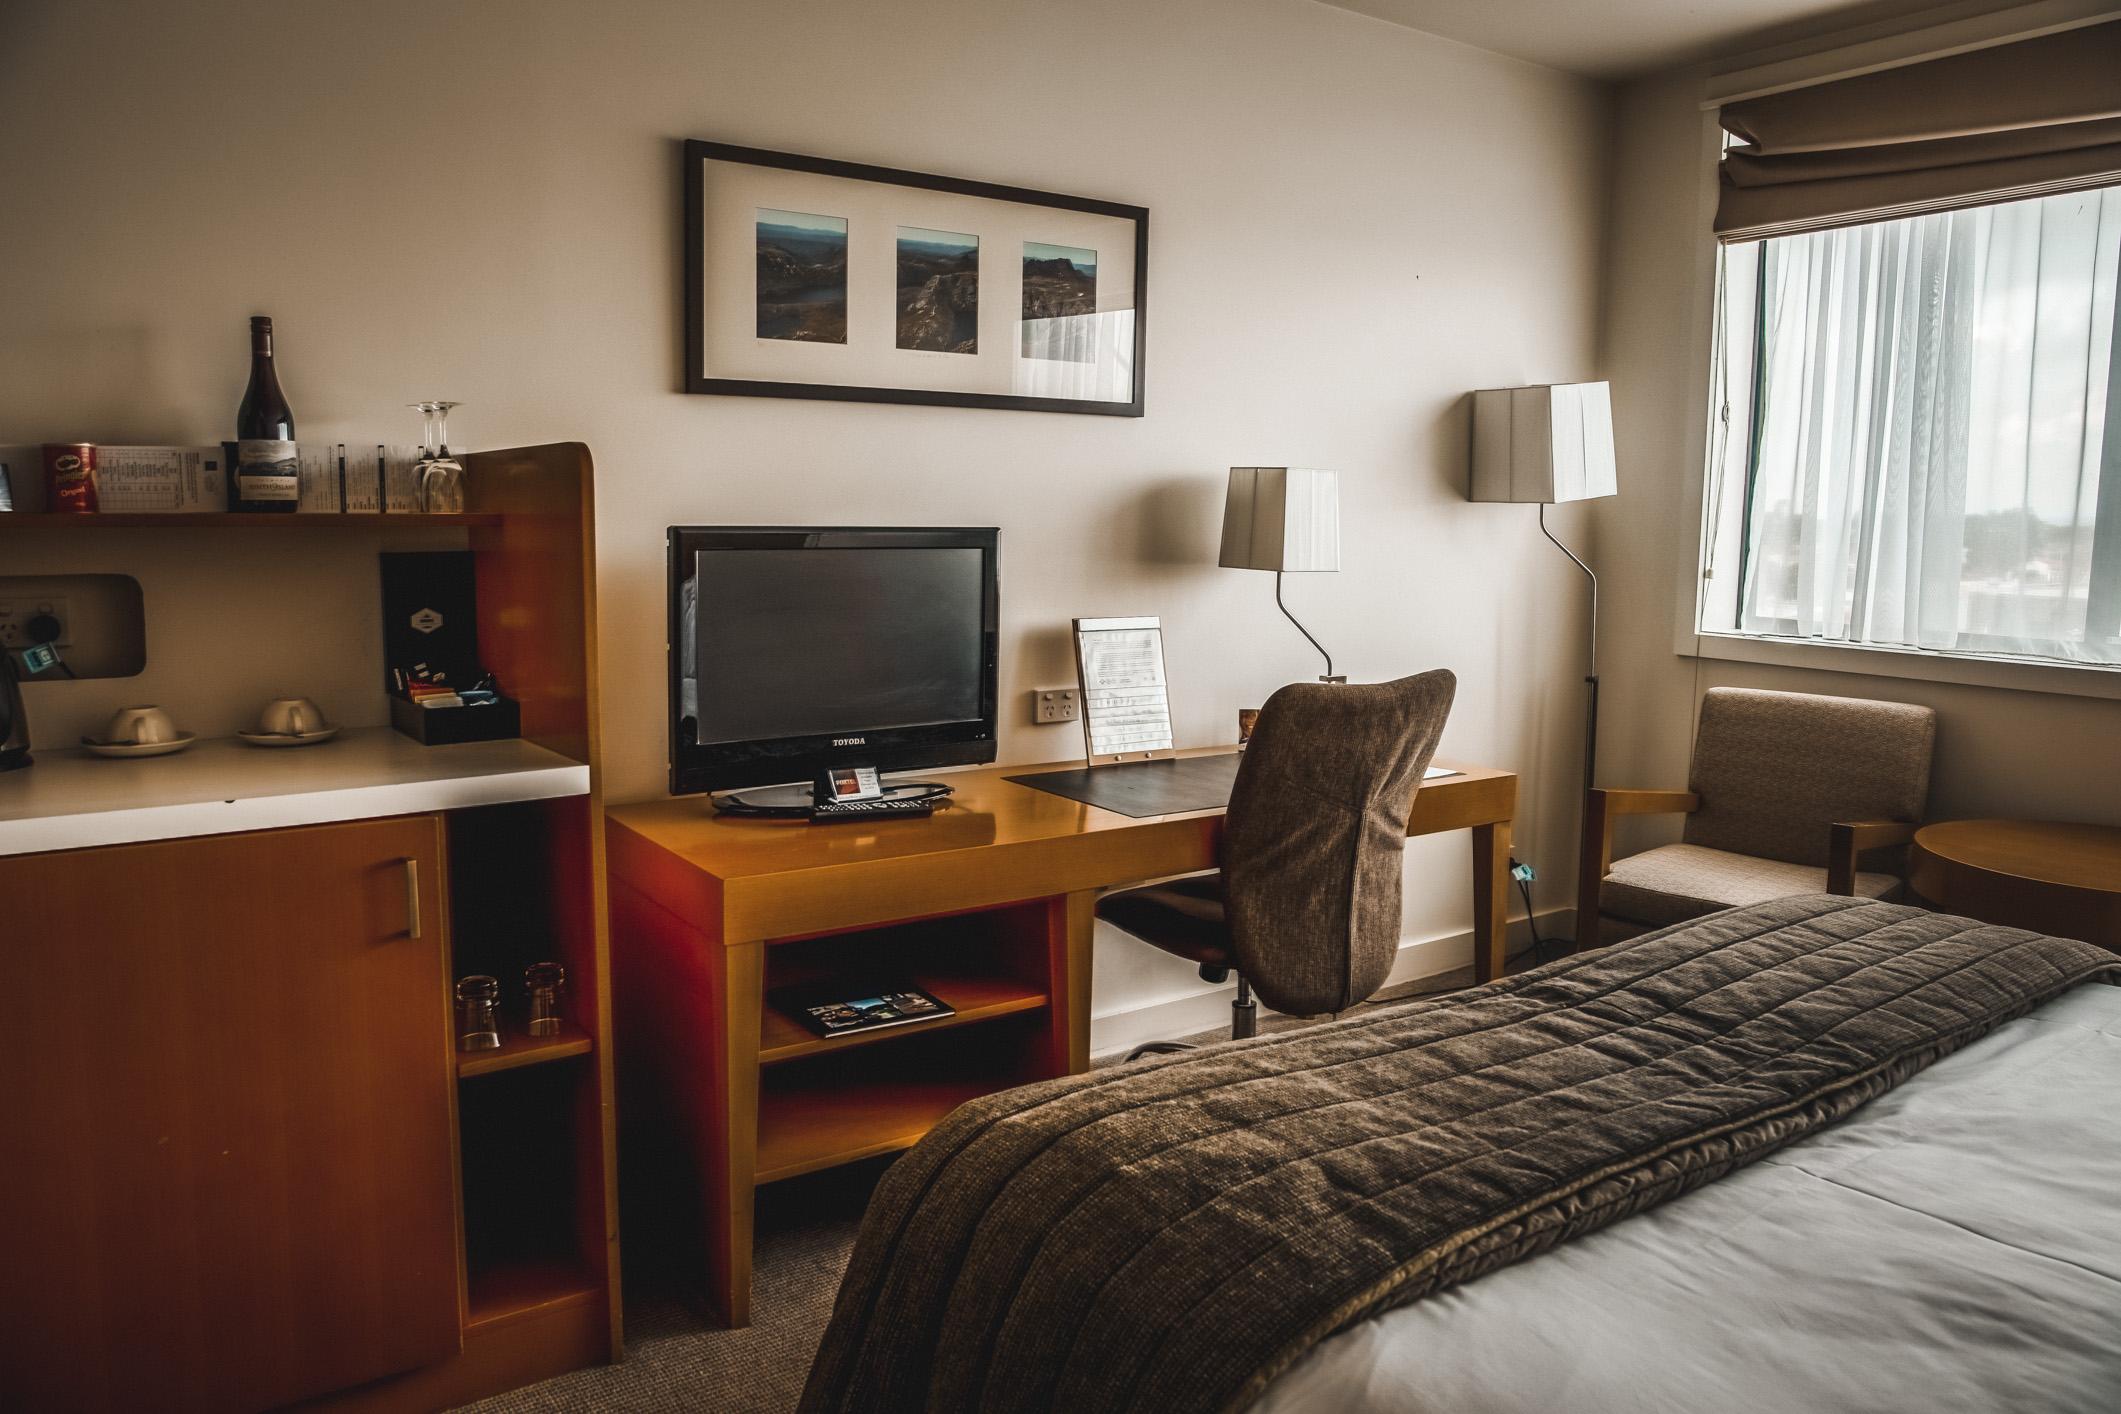 Gateway Hotel (Web) (4 of 15).jpg